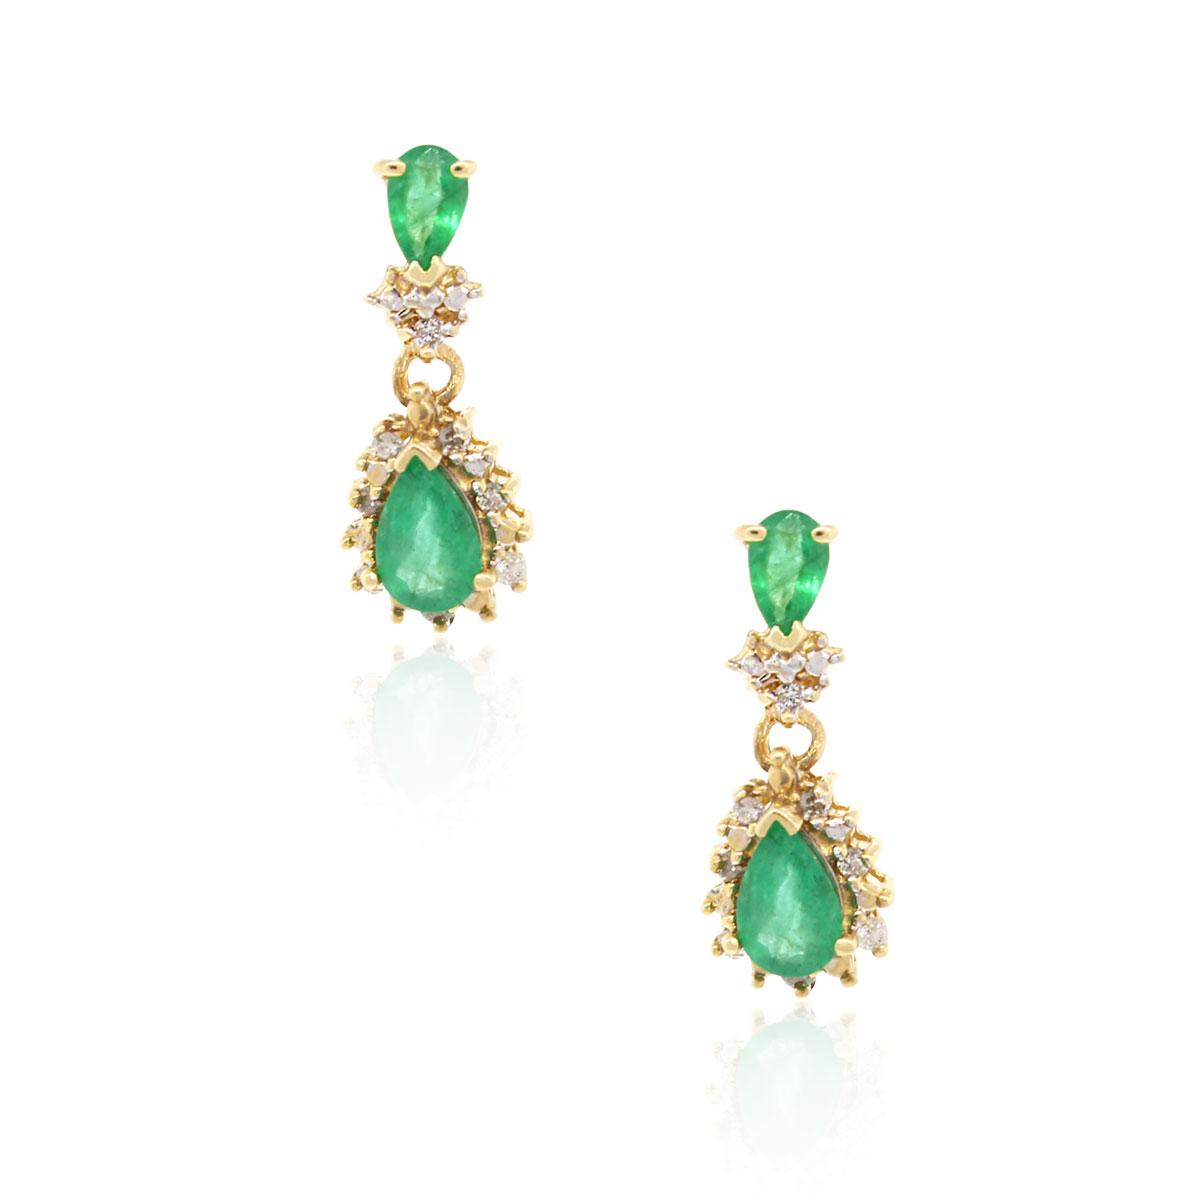 14k Yellow Gold Diamond Emerald Earrings